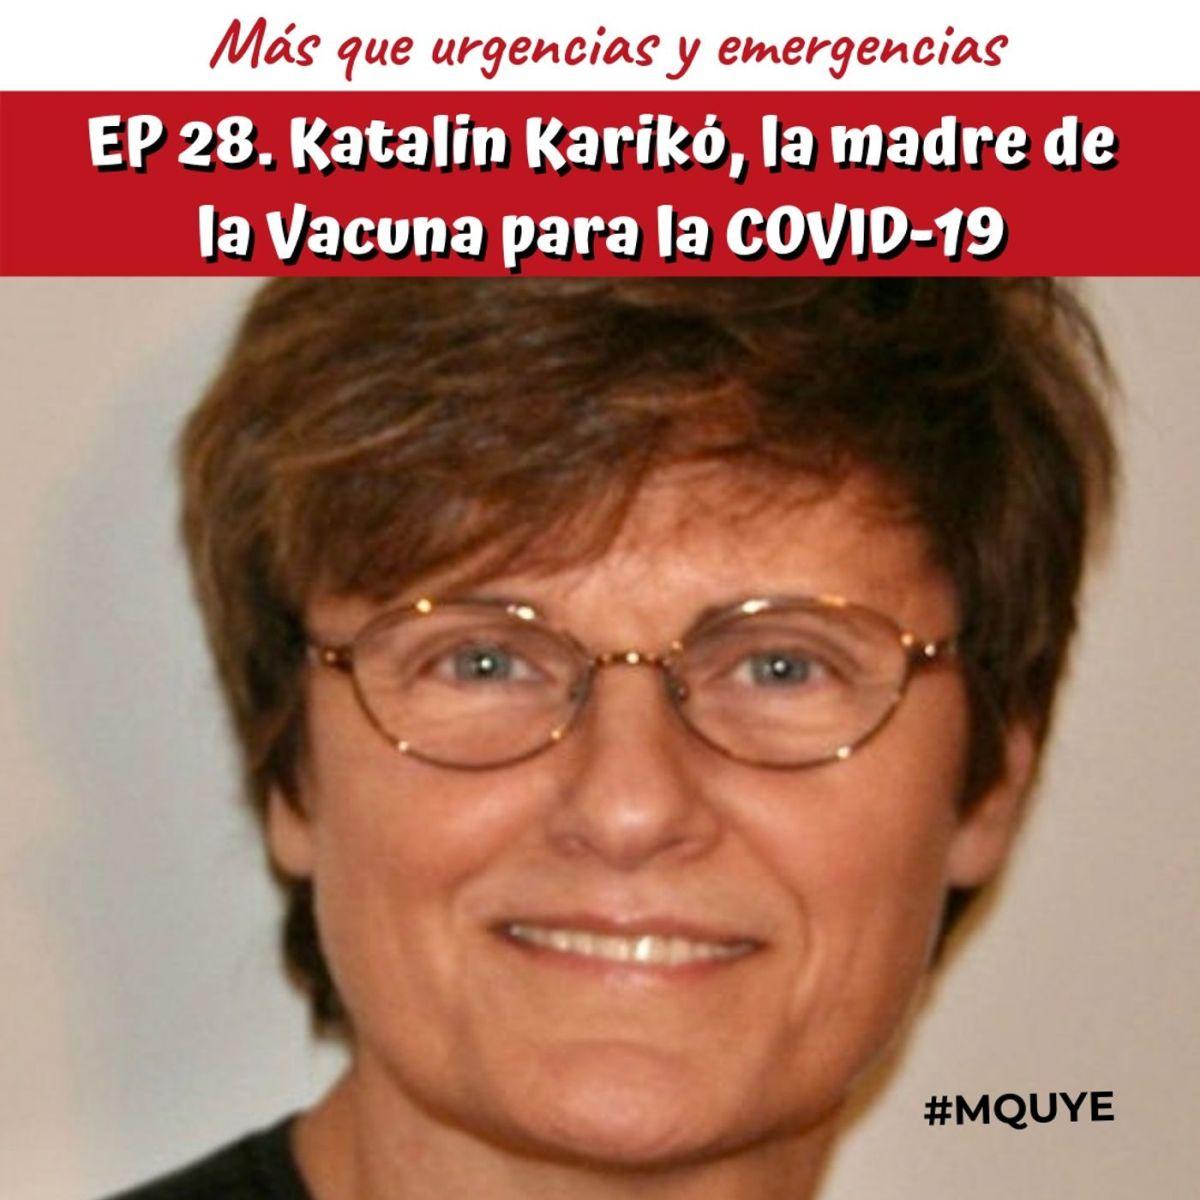 EP28. Katalin Karikó, la madre de la vacuna contra la COVID-19